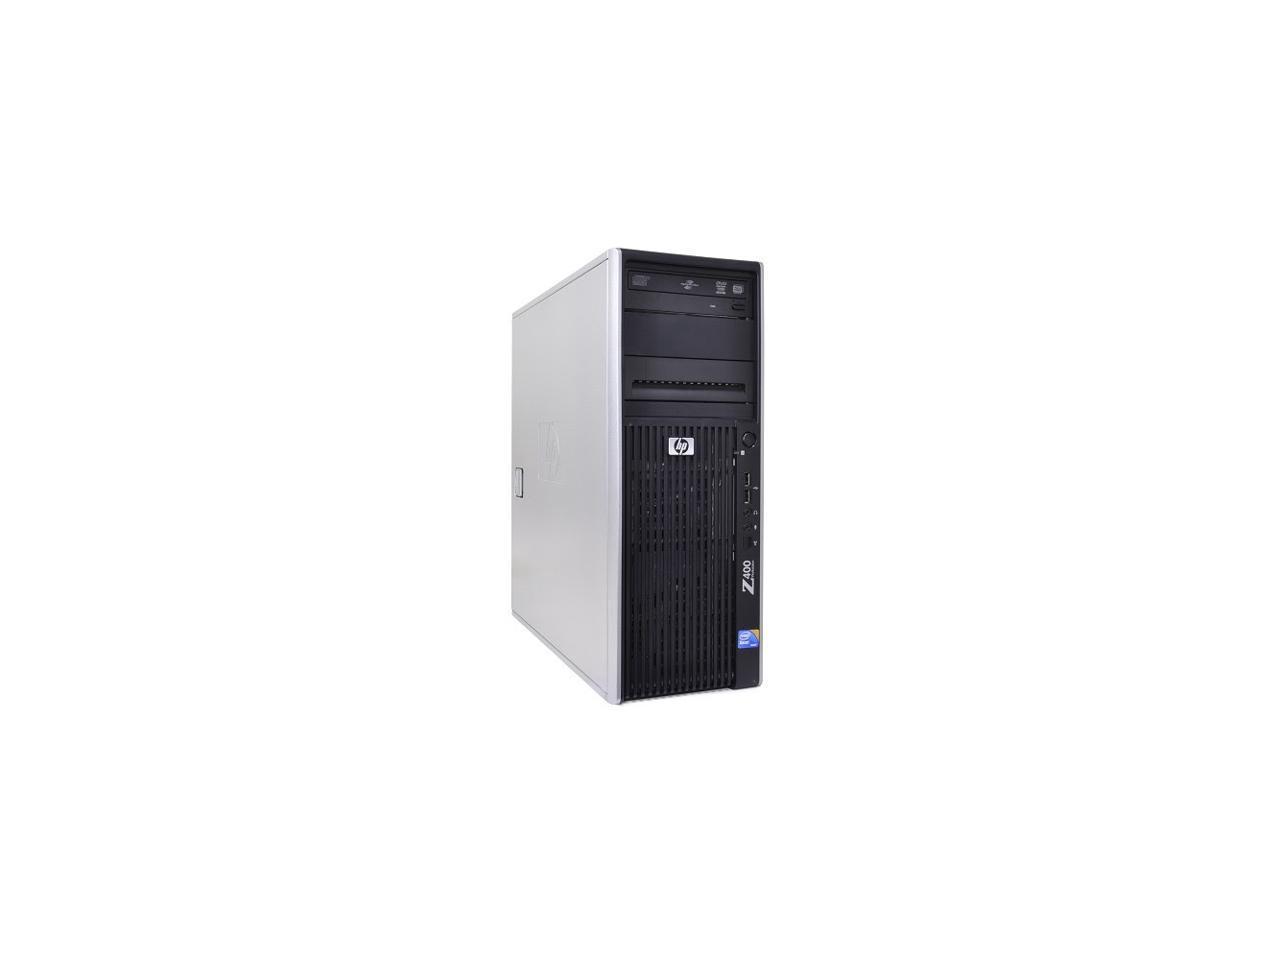 HP Z400 Workstation, Xeon Quad-Core, 3.2GHz, 8GB Ram, 1 TB Hard Drive, NVS 290 Video Card (Refurb) $230